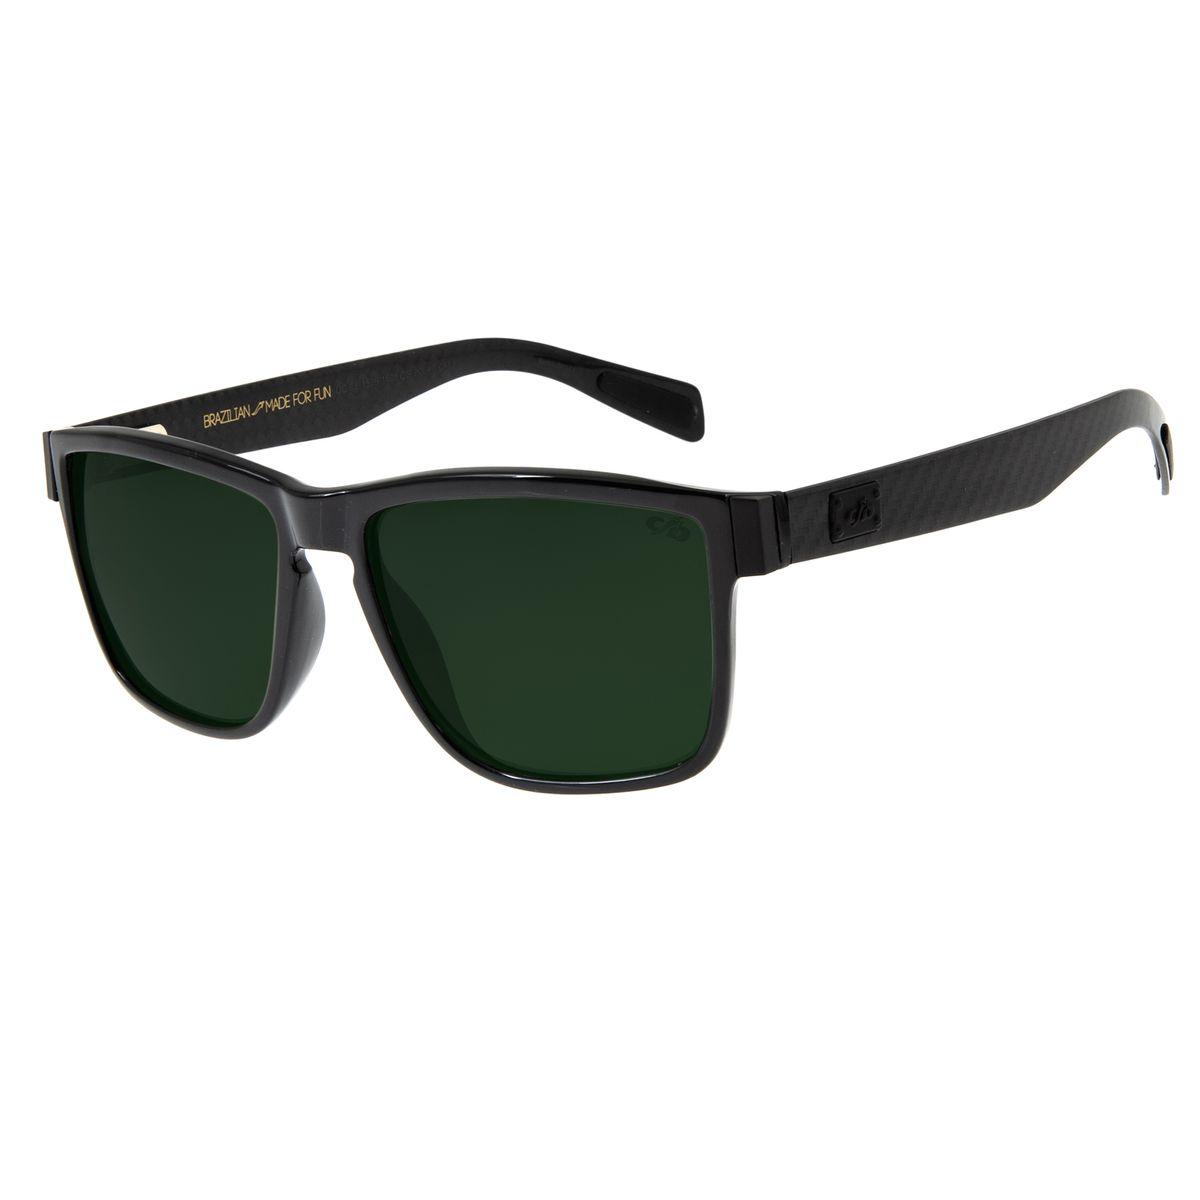 bb0cf4ee4 Óculos de Sol Masculino Chilli Beans Quadrado Verde Polarizado ...